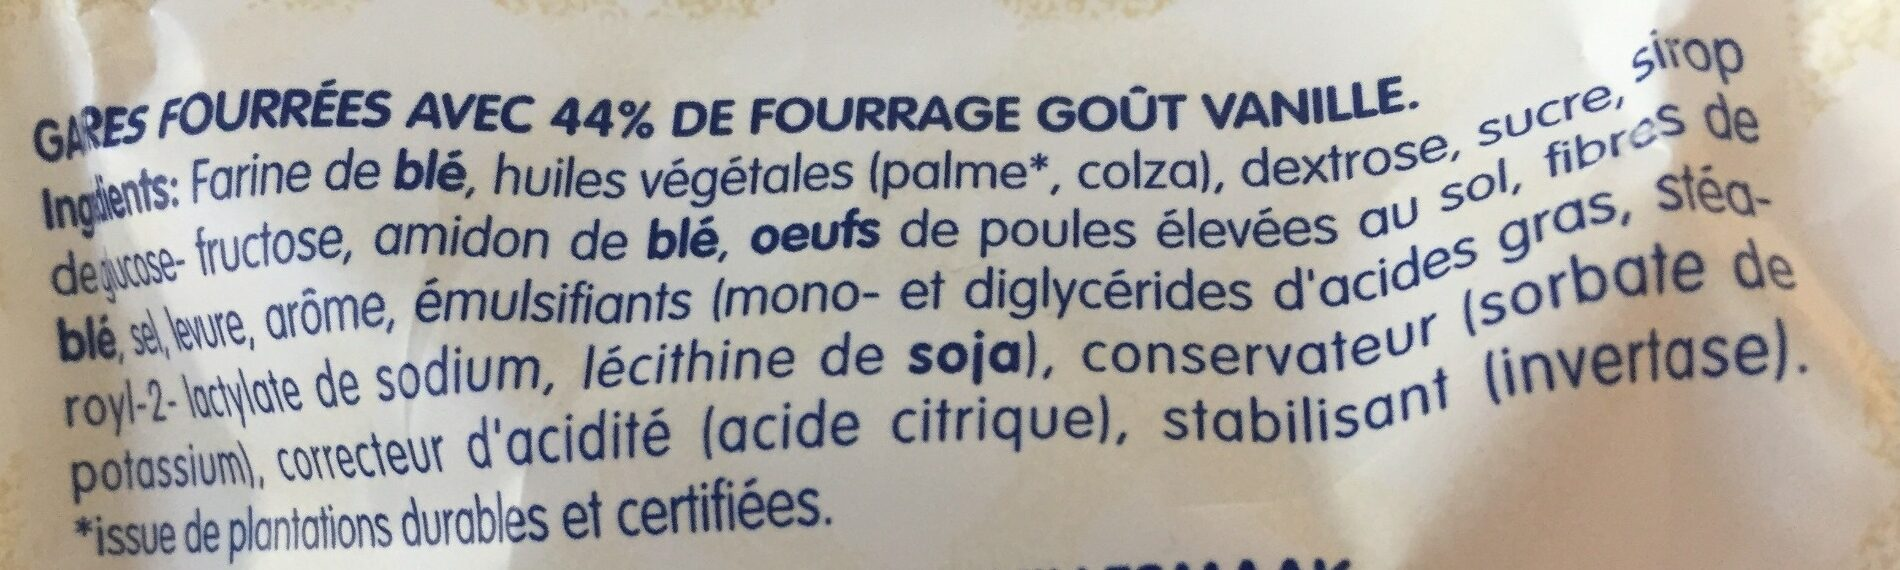 Gaufres fourrees - Ingrediënten - fr